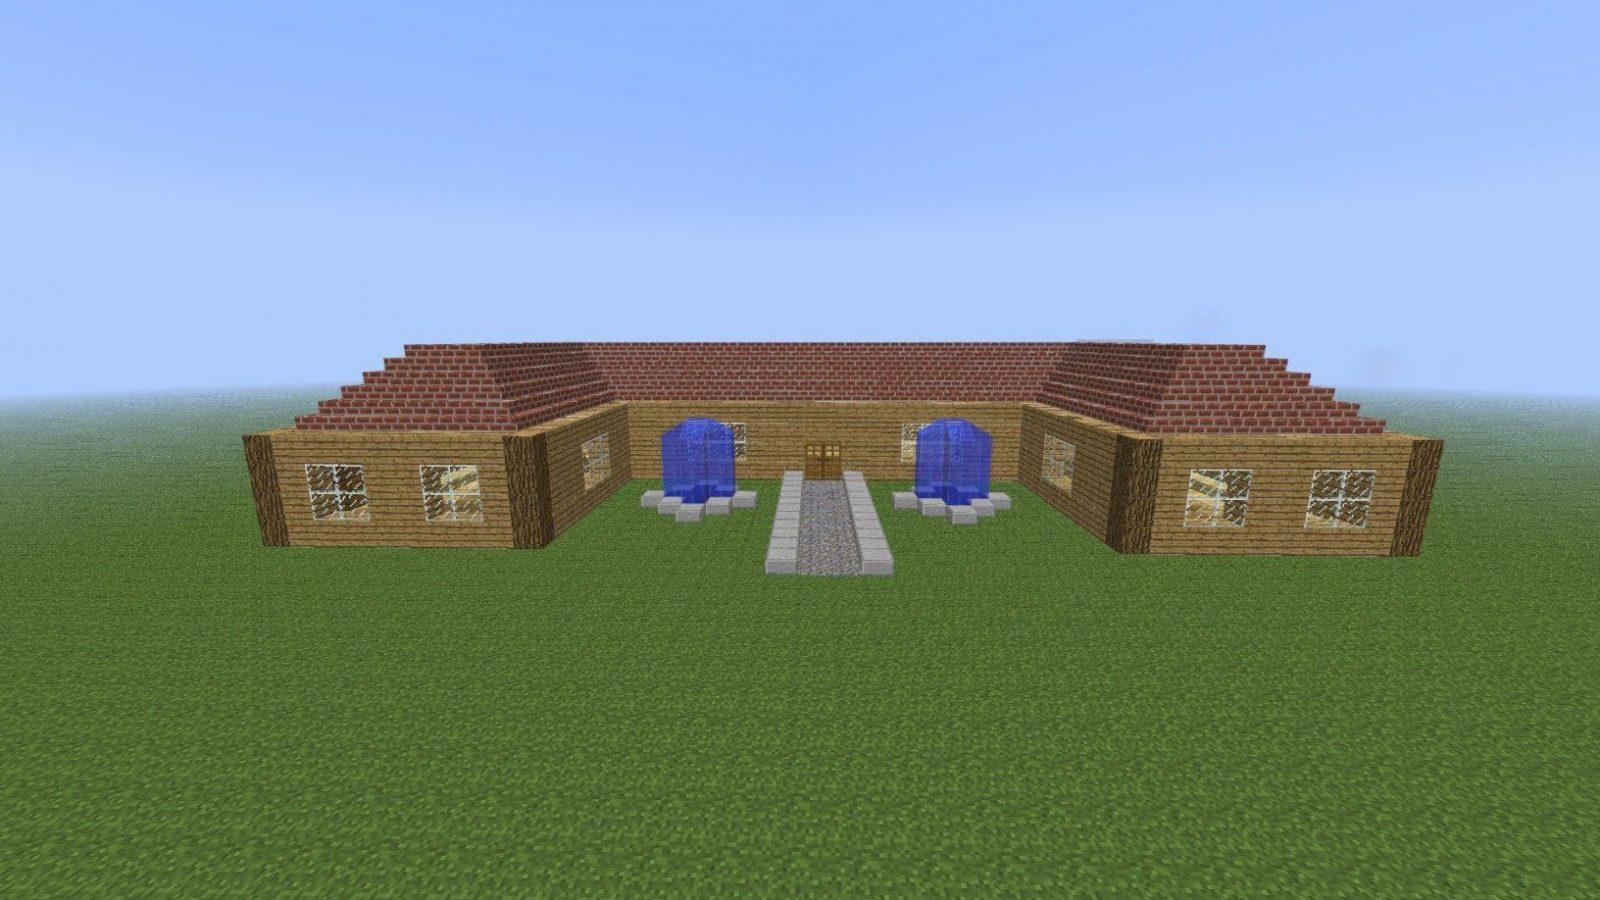 Top Minecraft Häuser Bauen Anleitung | Haus Design Ideen &RD_41